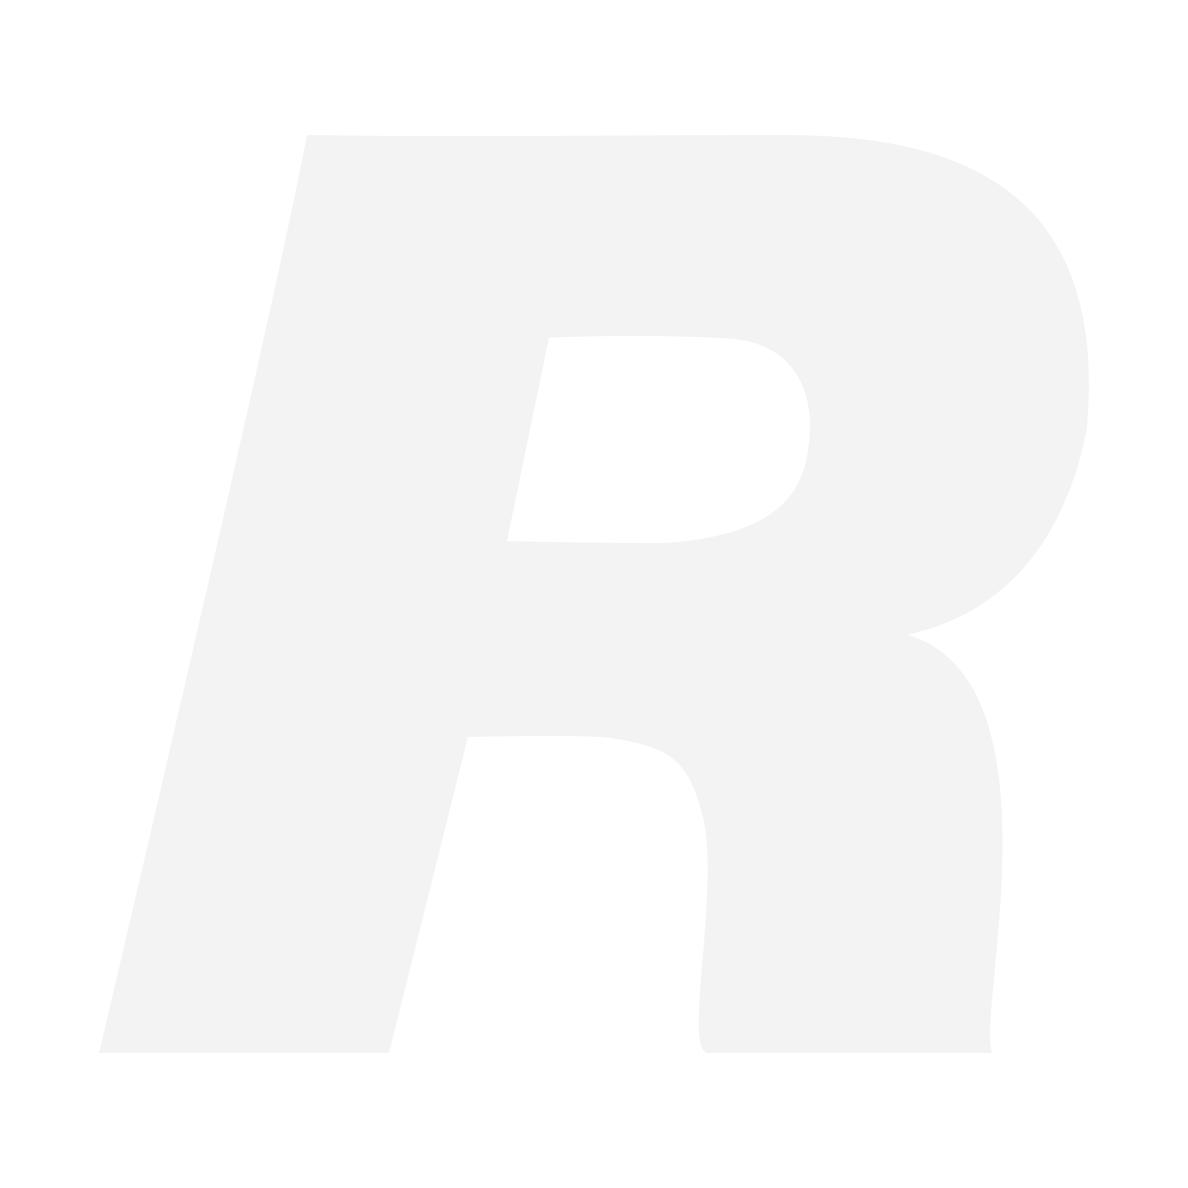 Lastolite LR3031 Reflector Silver/White 75cm